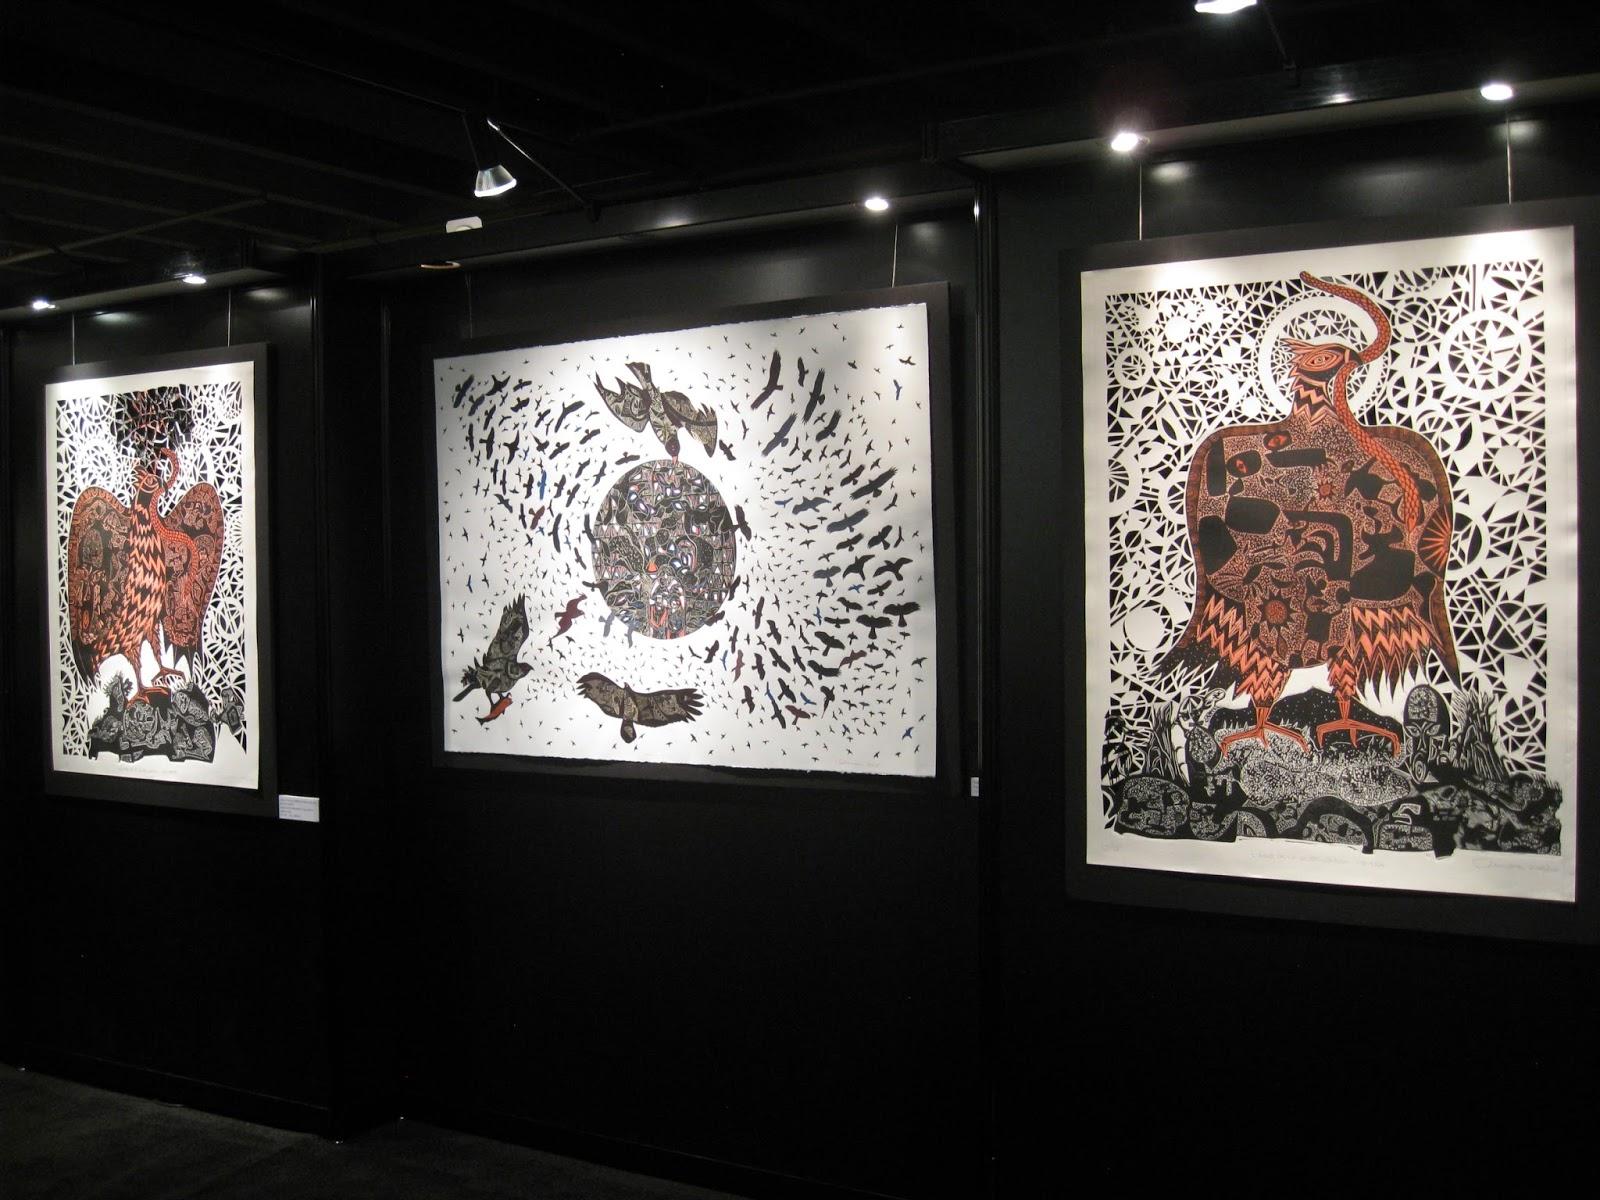 Art frame salon du livre 2016 ren derouin - Salon du livre brive ...